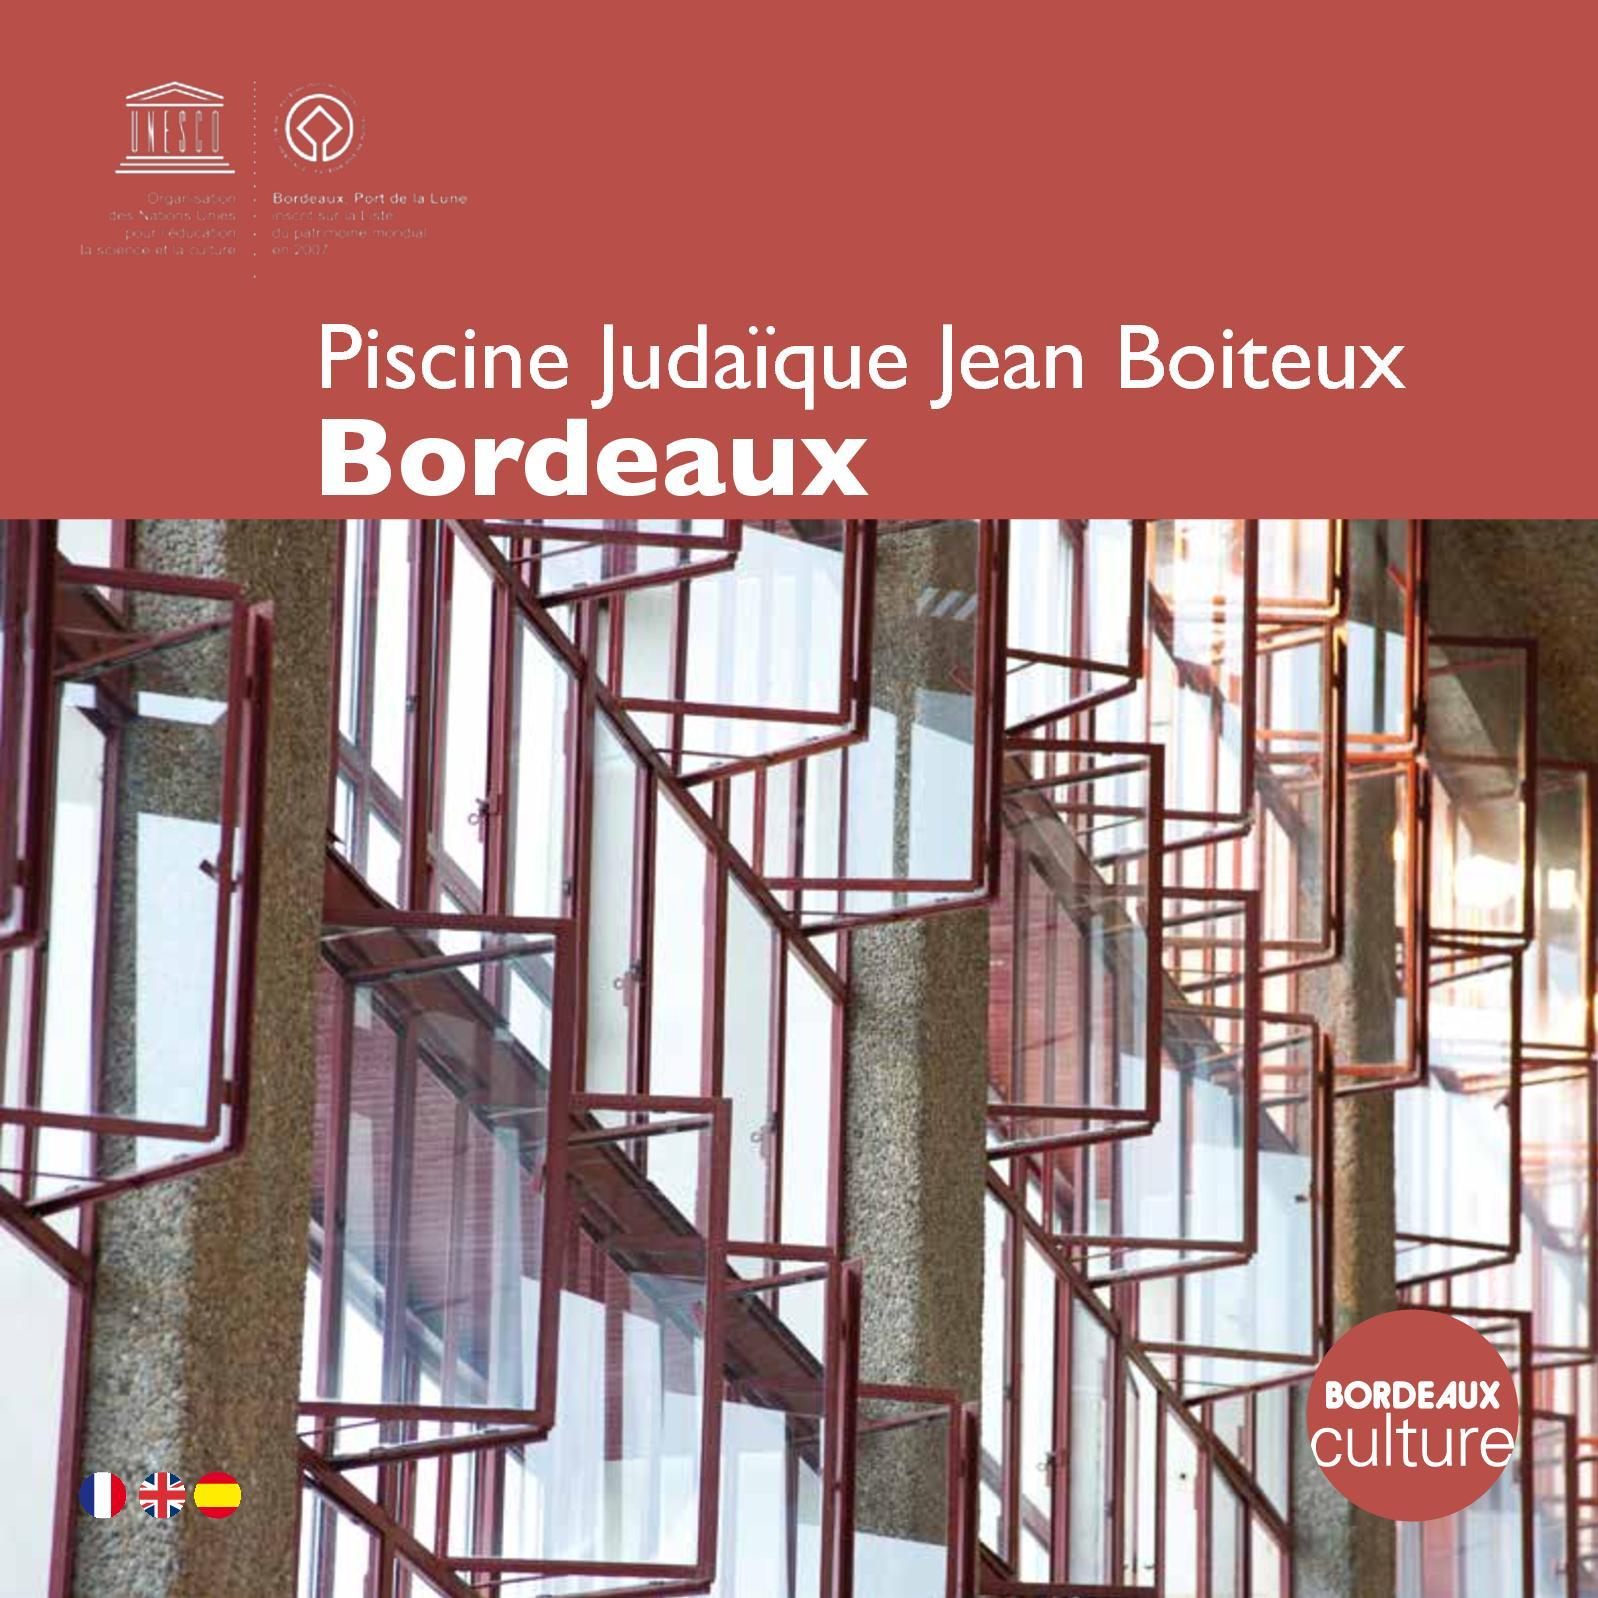 Calameo Piscine Judaique Jean Boiteux